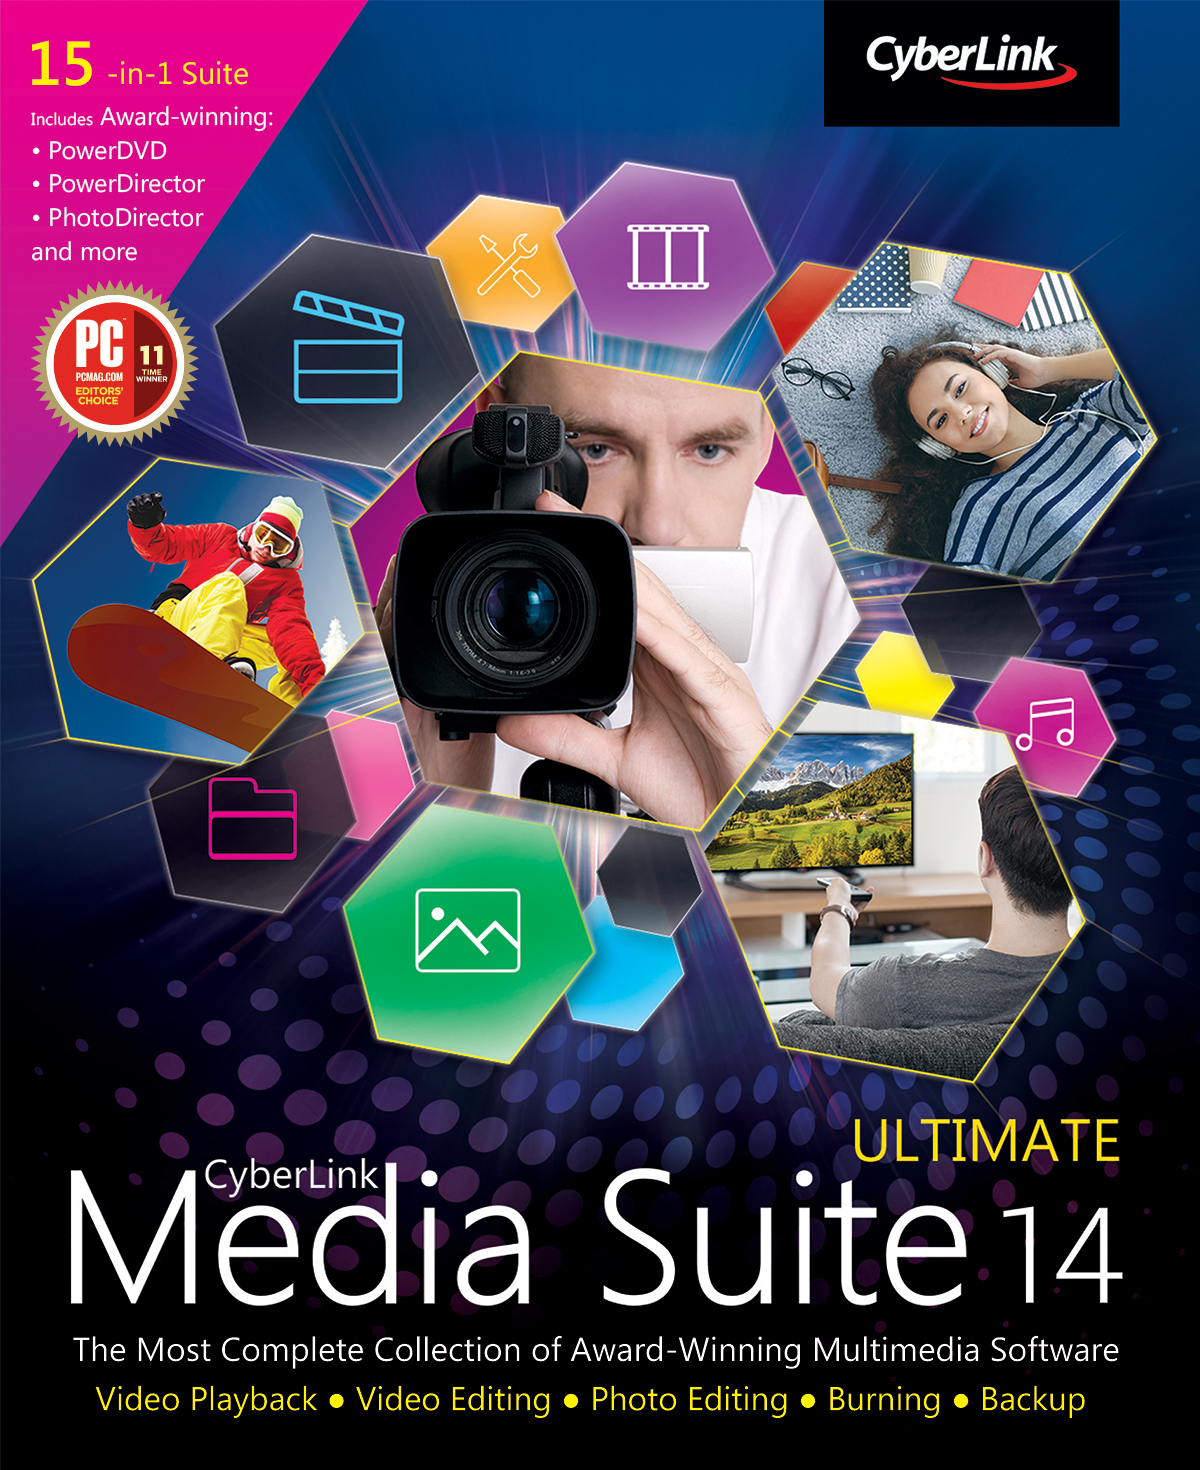 cyberlink-media-suite-14-ultimate-download